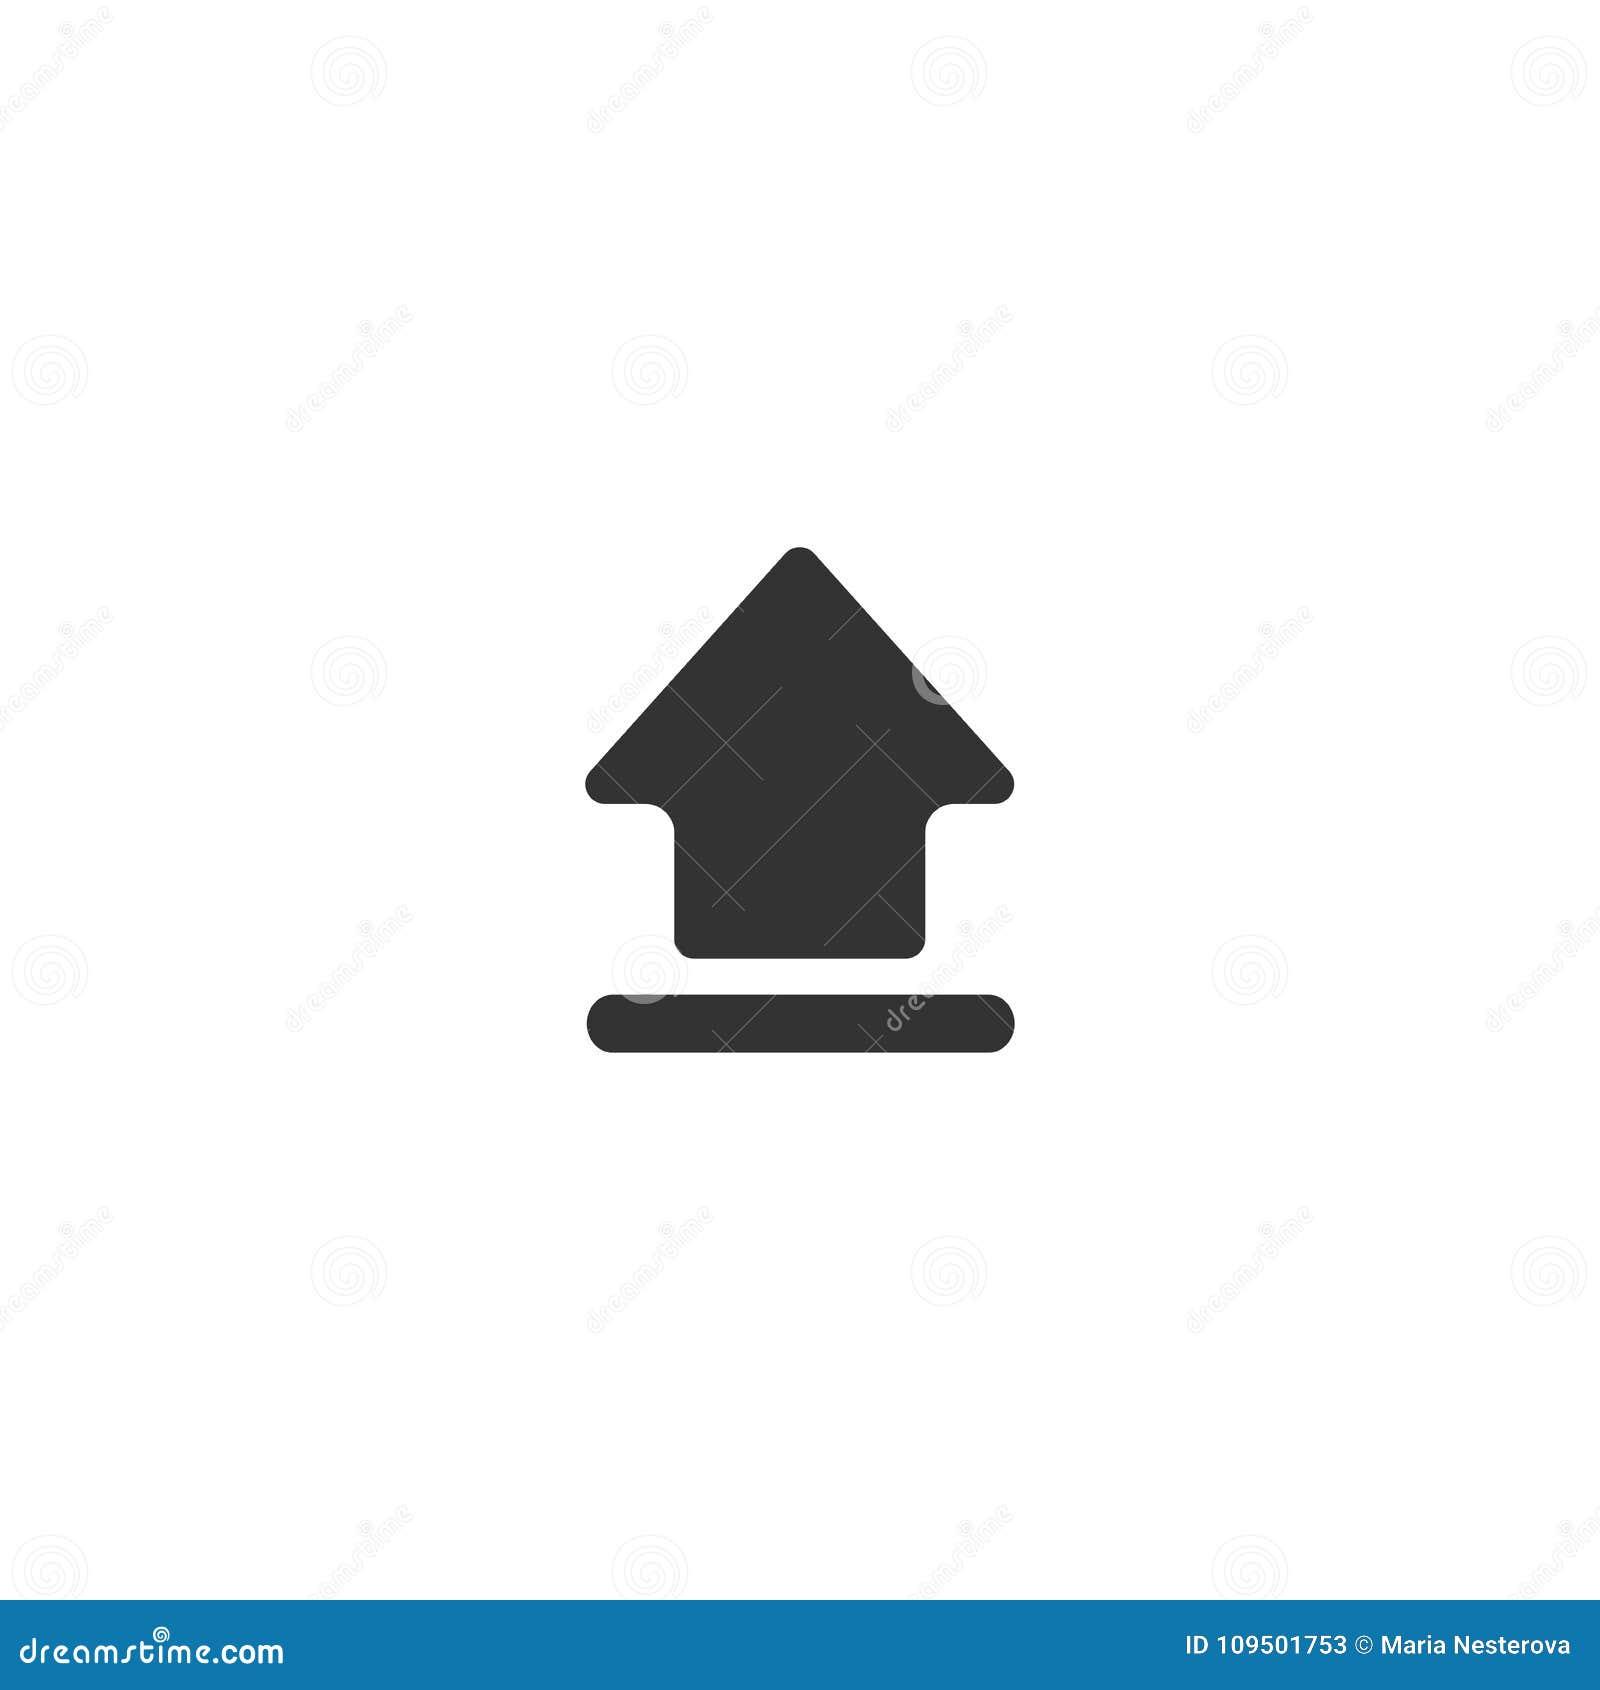 Black arrow up icon. Isolated on white. Upload icon. Upgrade sign.